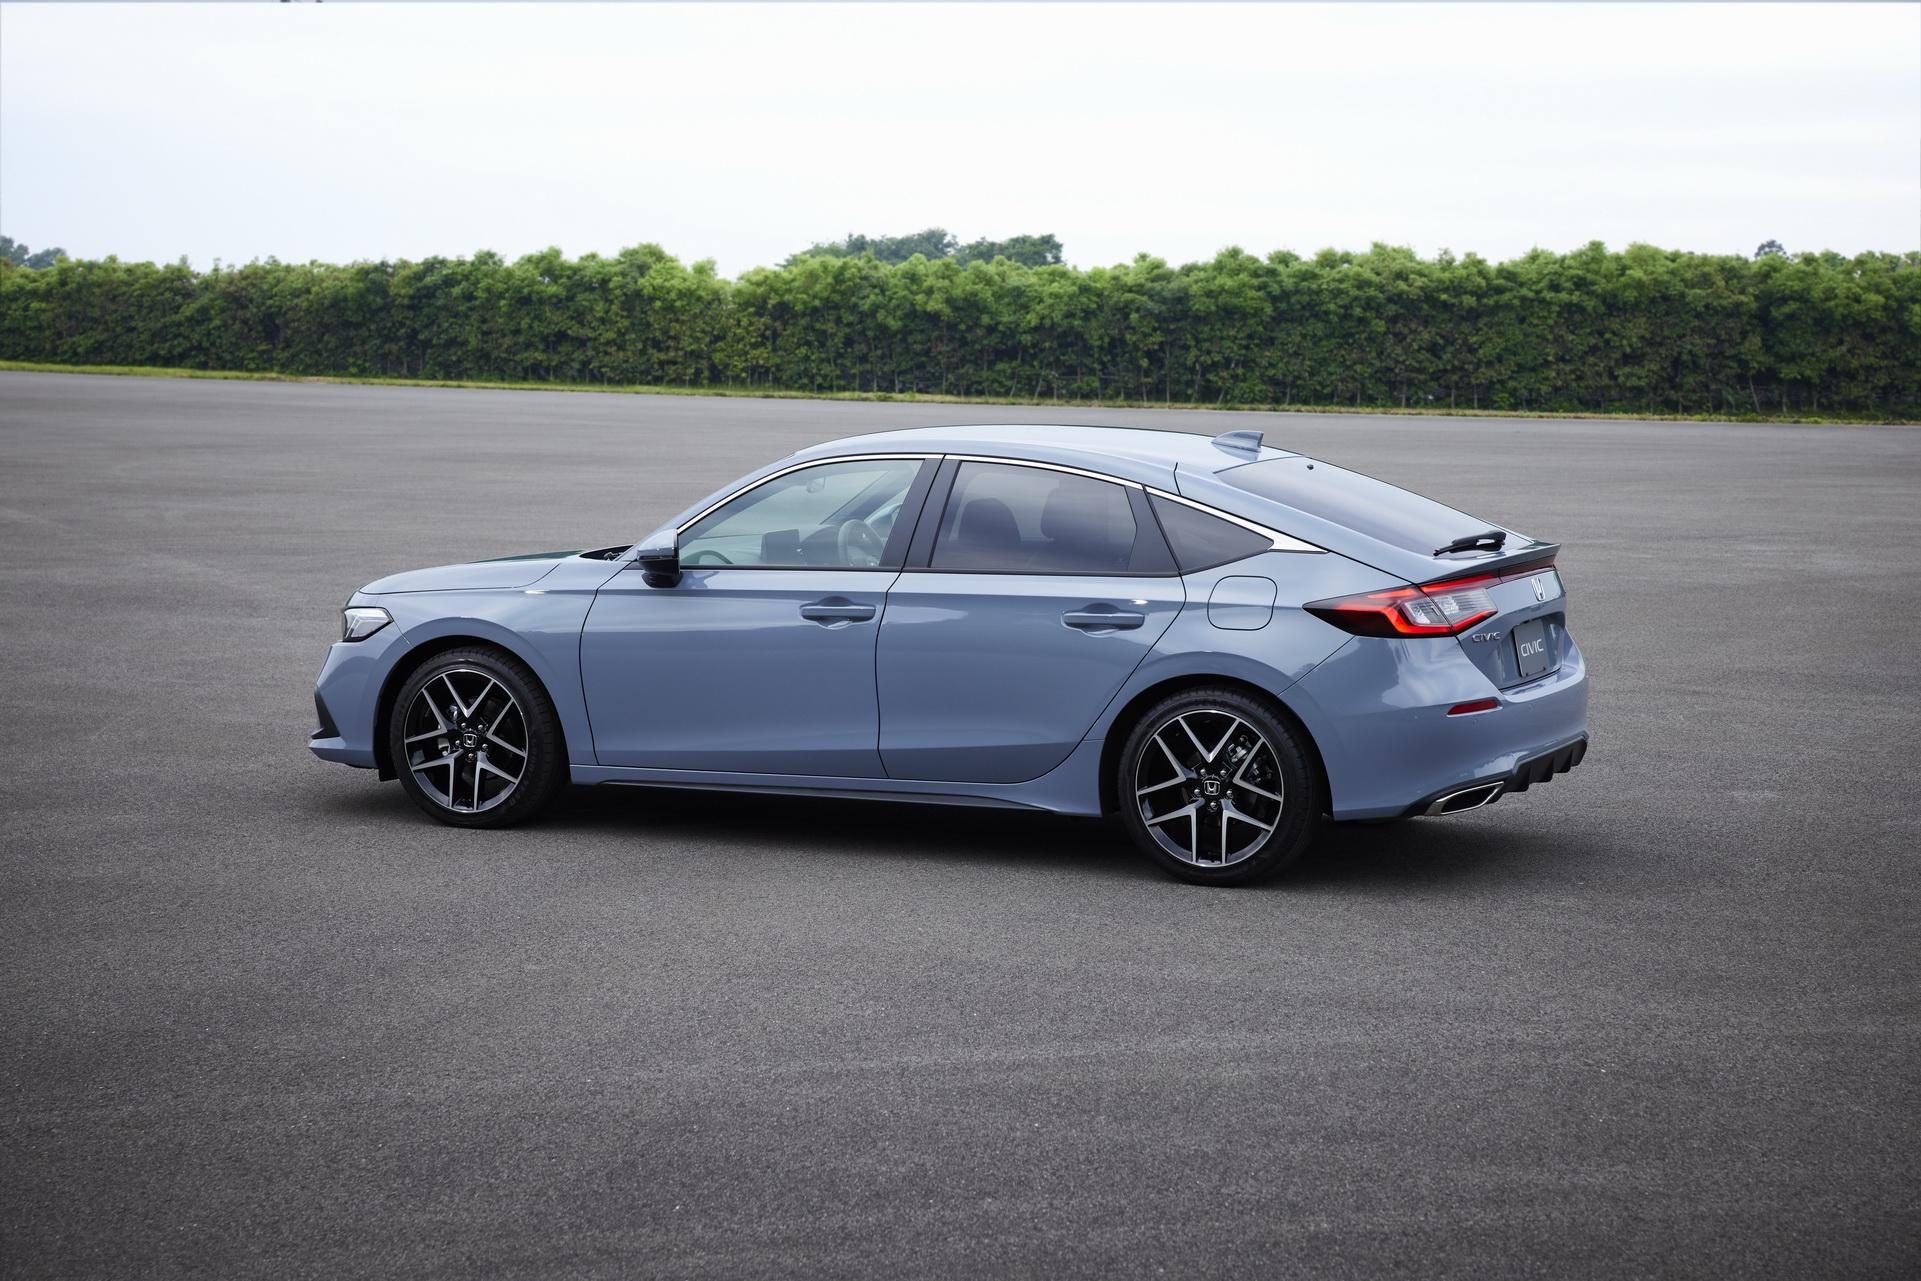 Honda-Civic-hatchback-12